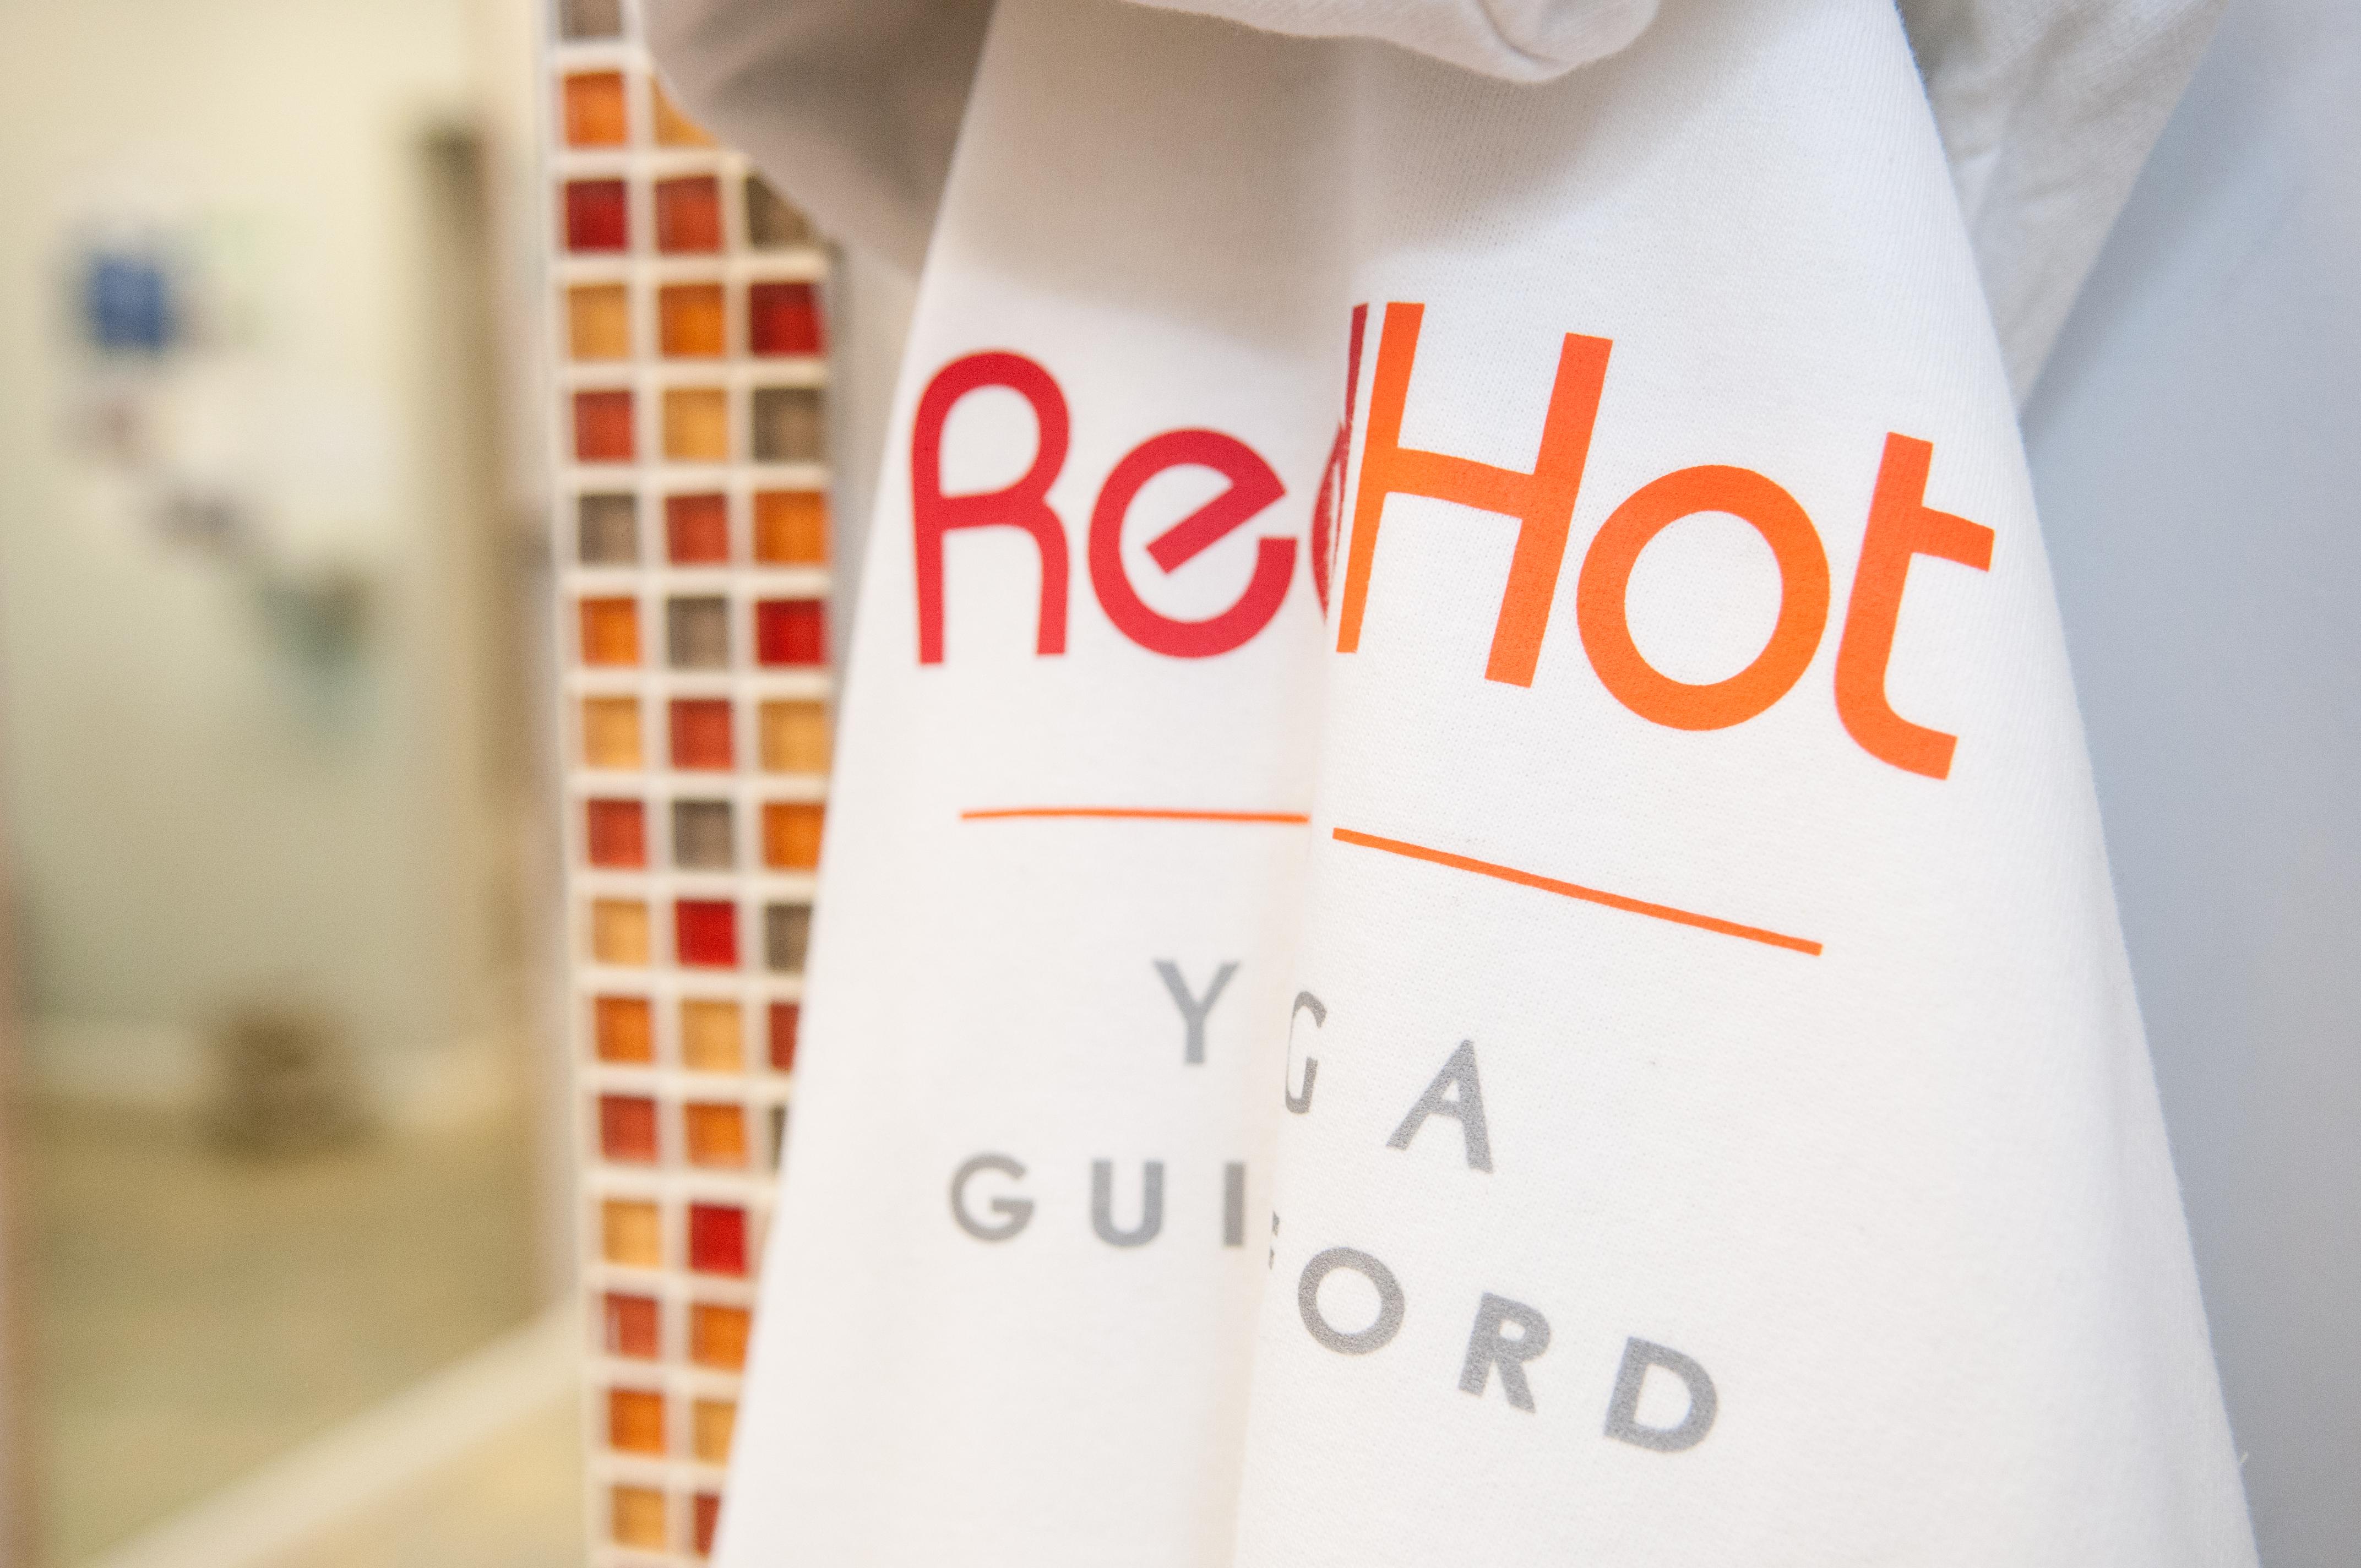 Red Hot Yoga Branding